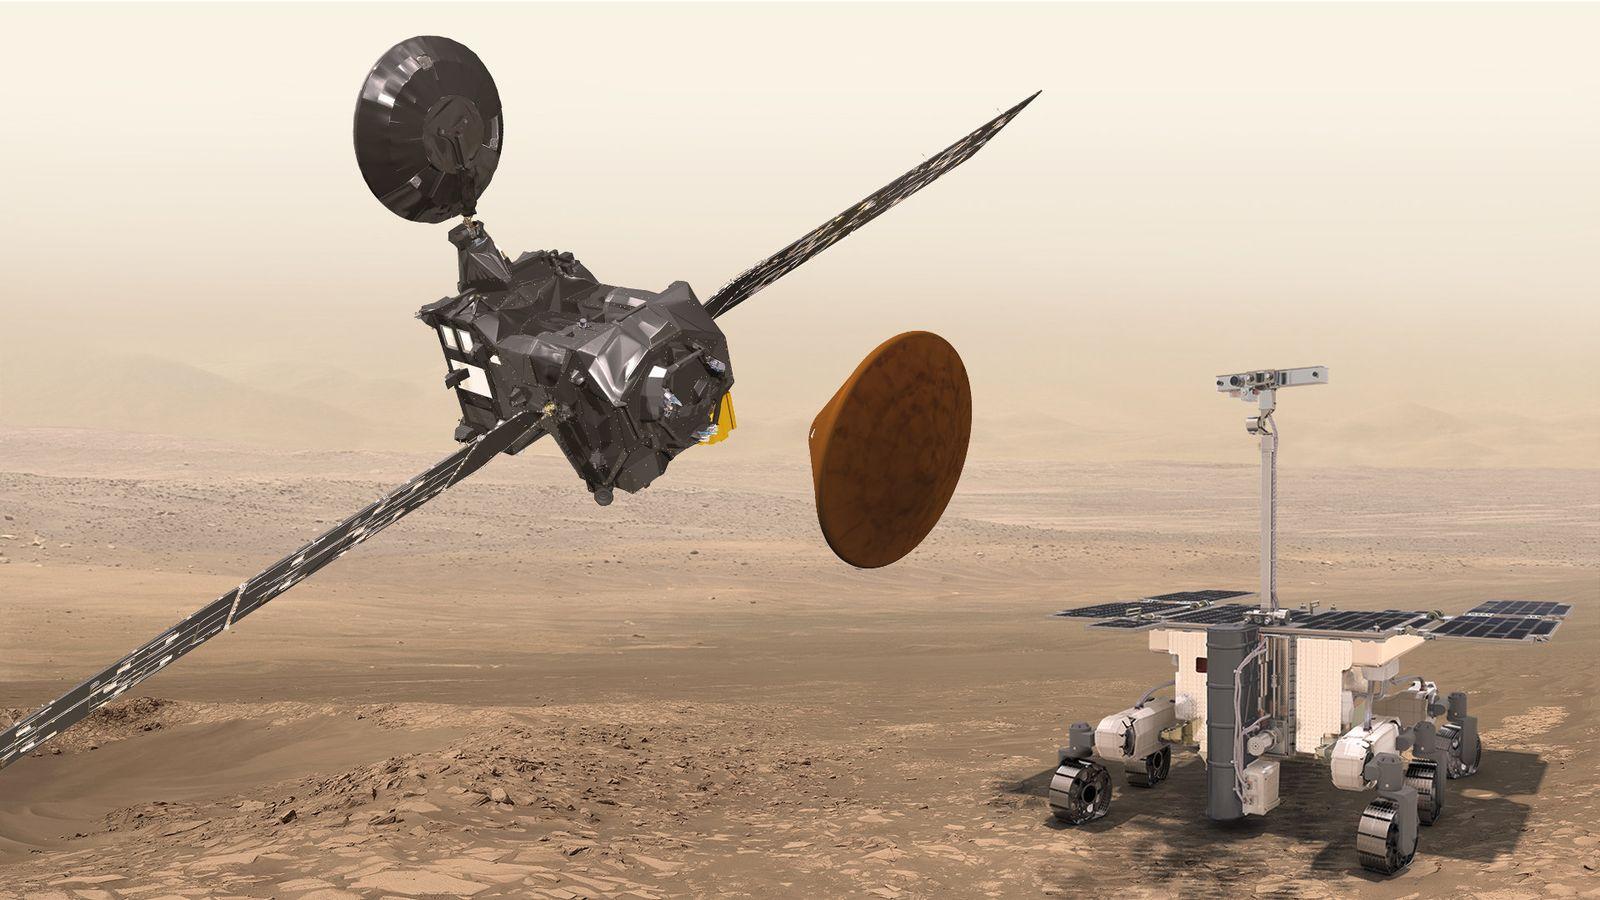 ExoMars - Trace Gas Orbiter, Schiaparelli and the ExoMars rover